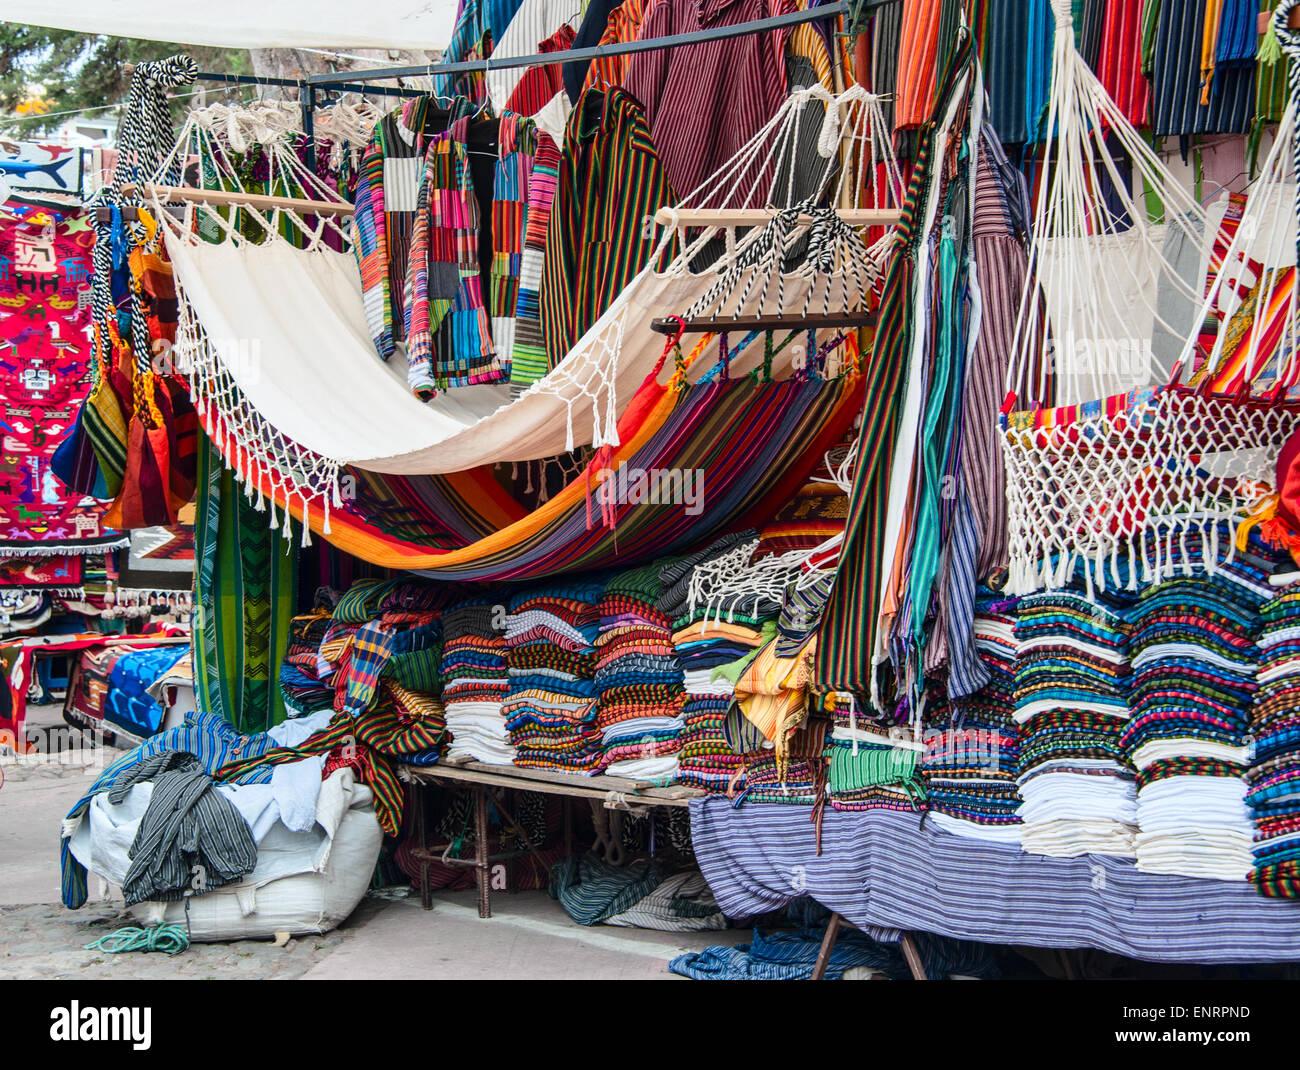 Famous Indian market in Otavalo, Imbabura, Ecuador, South America - Stock Image